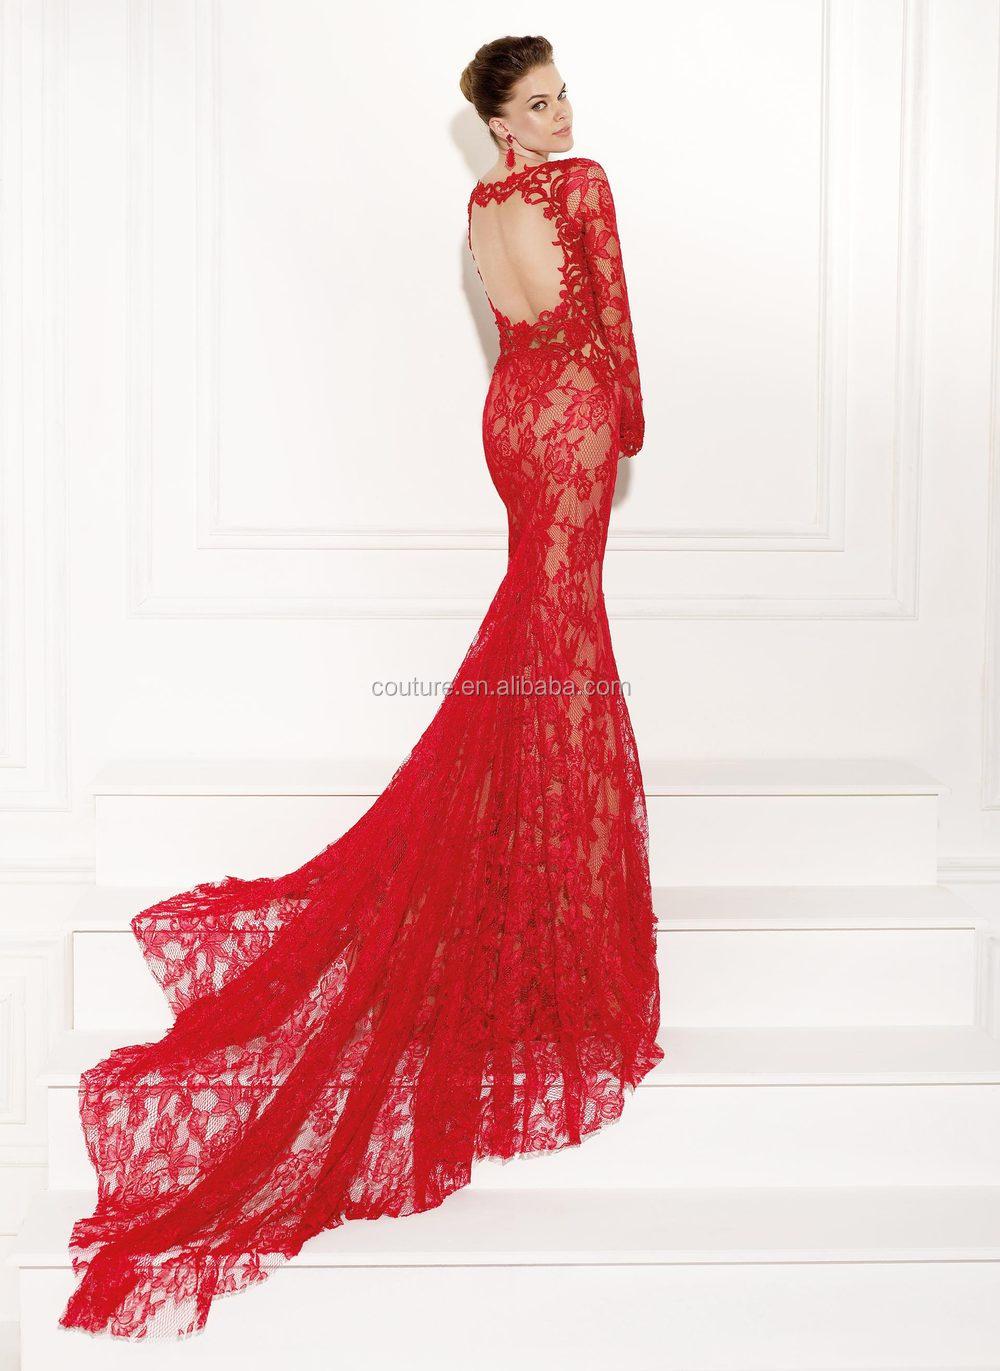 2014 mode robes Scoop cou à manches longues rouge dentelle corsage Custom Made 2015 Tarik Ediz